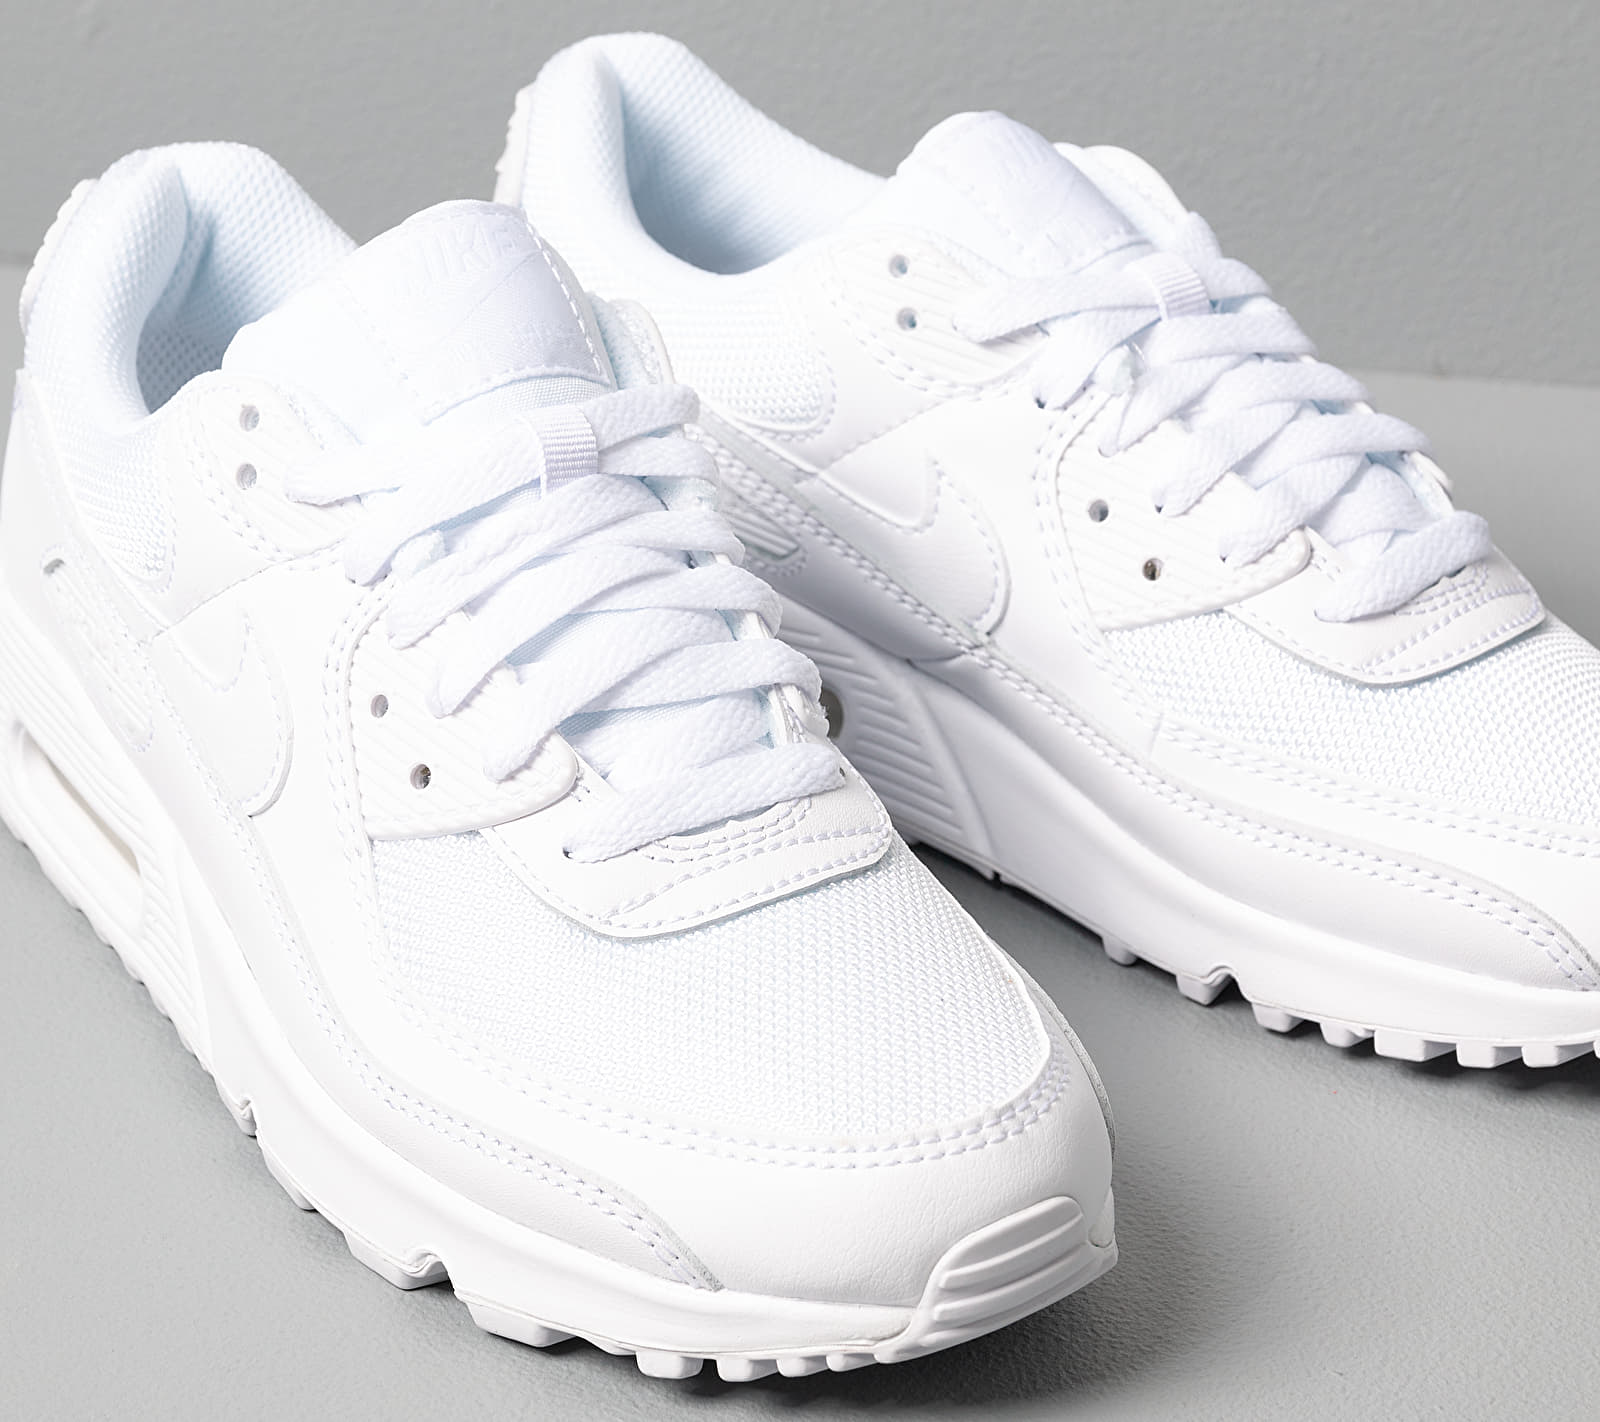 Nike W Air Max 90 White White White Wolf Grey Buy At The Price